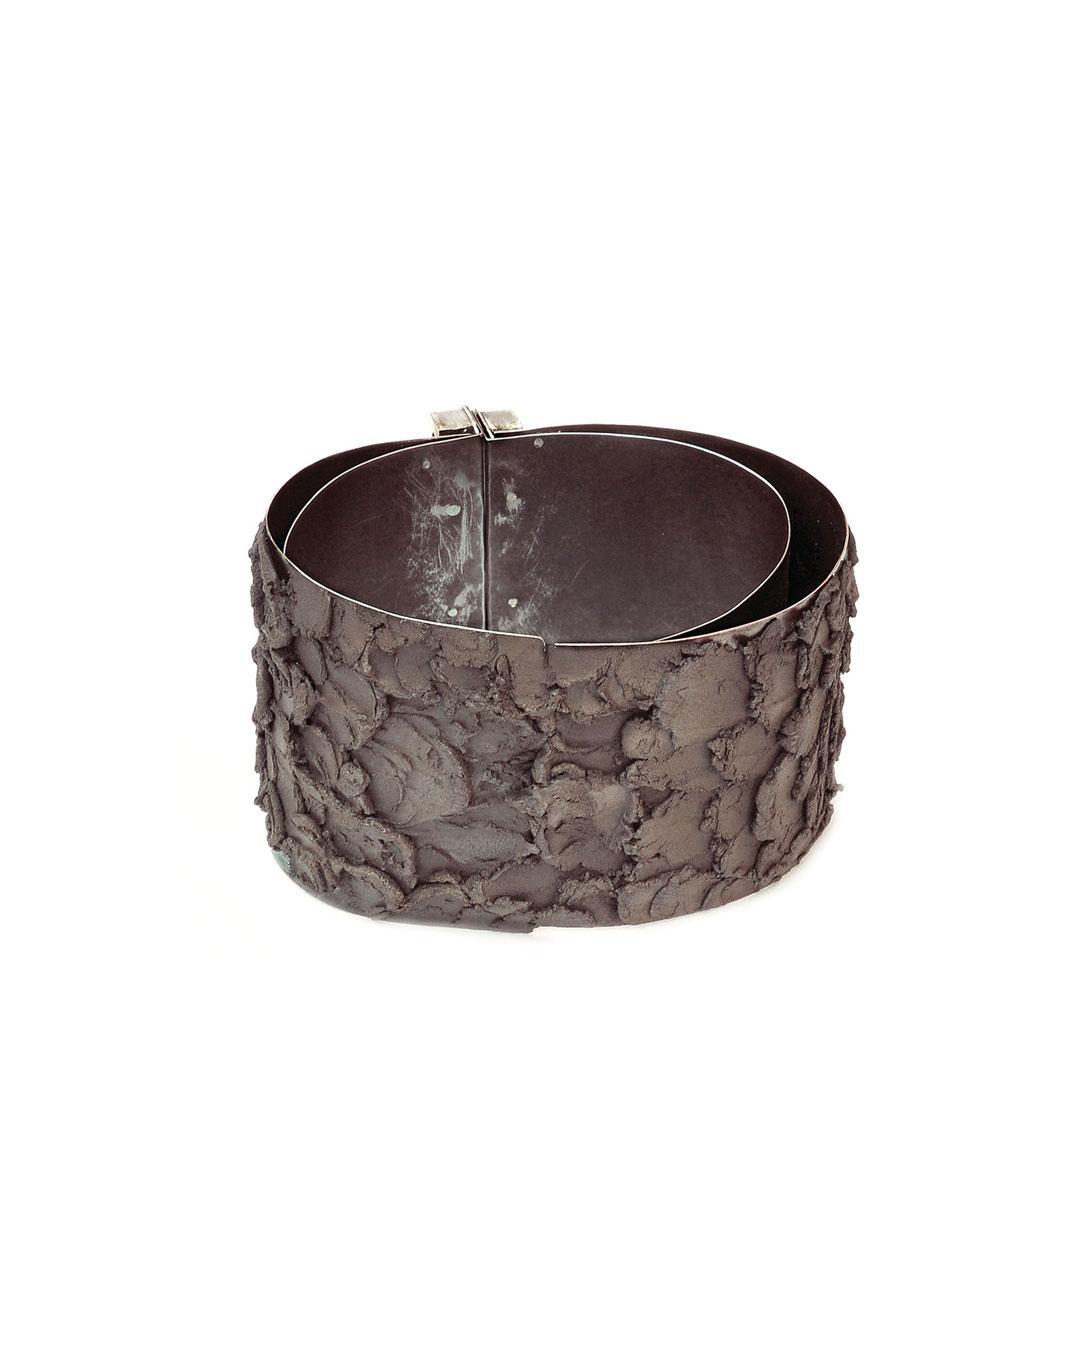 Stefano Marchetti, untitled, 2010, bracelet; titanium epoxy, steel, shibuichi, 80 x 50 x 10 mm, price on request